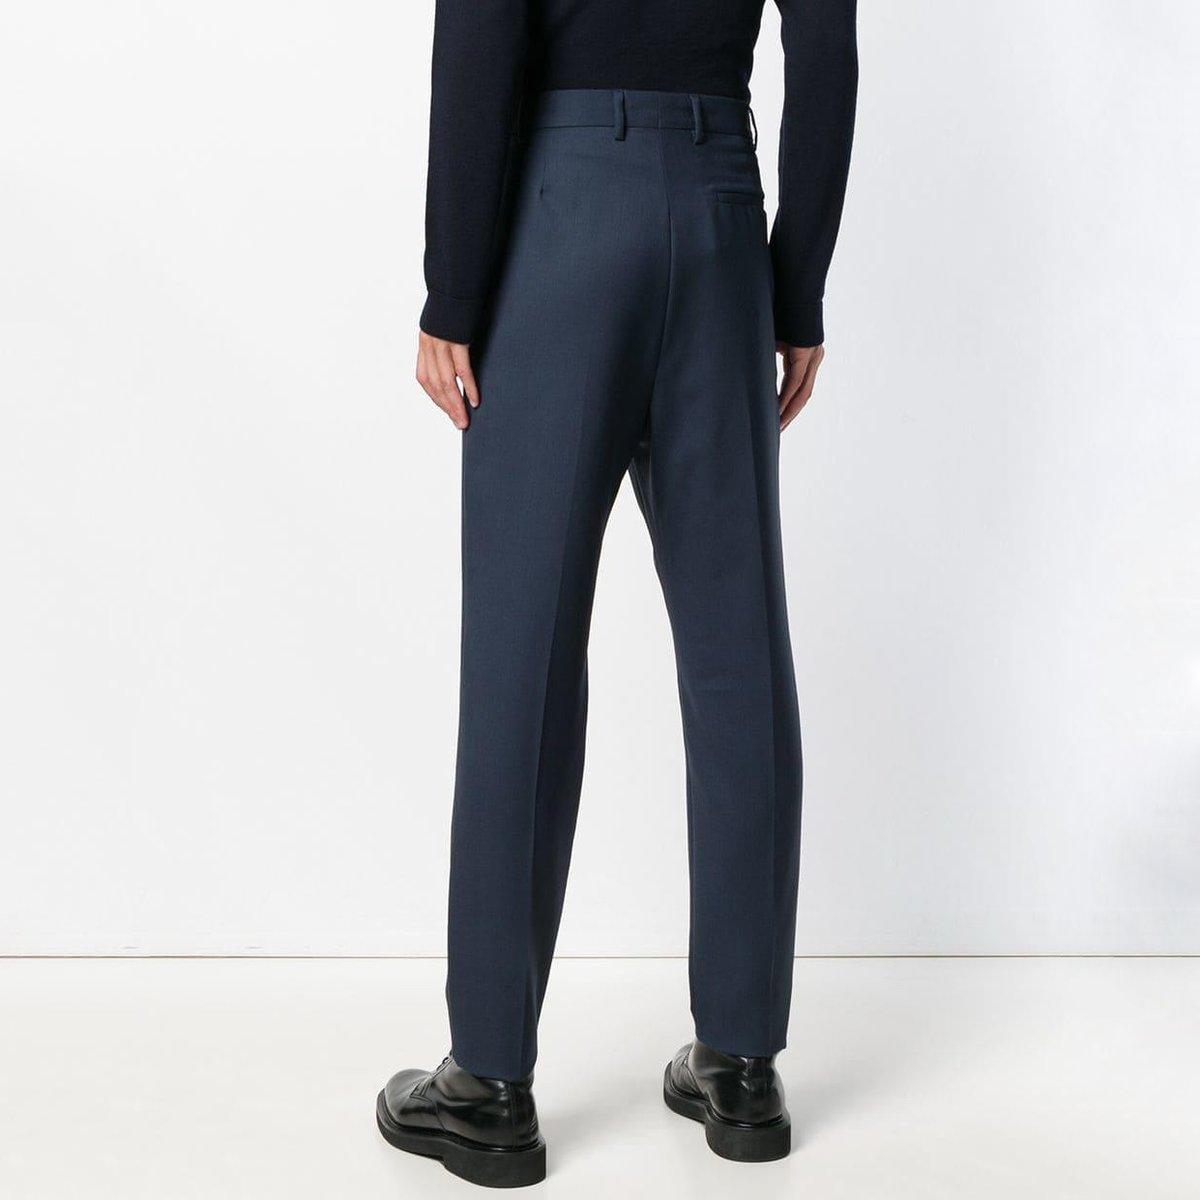 vivienne-westwood-Blue-Tailored-Trousers (3).jpg